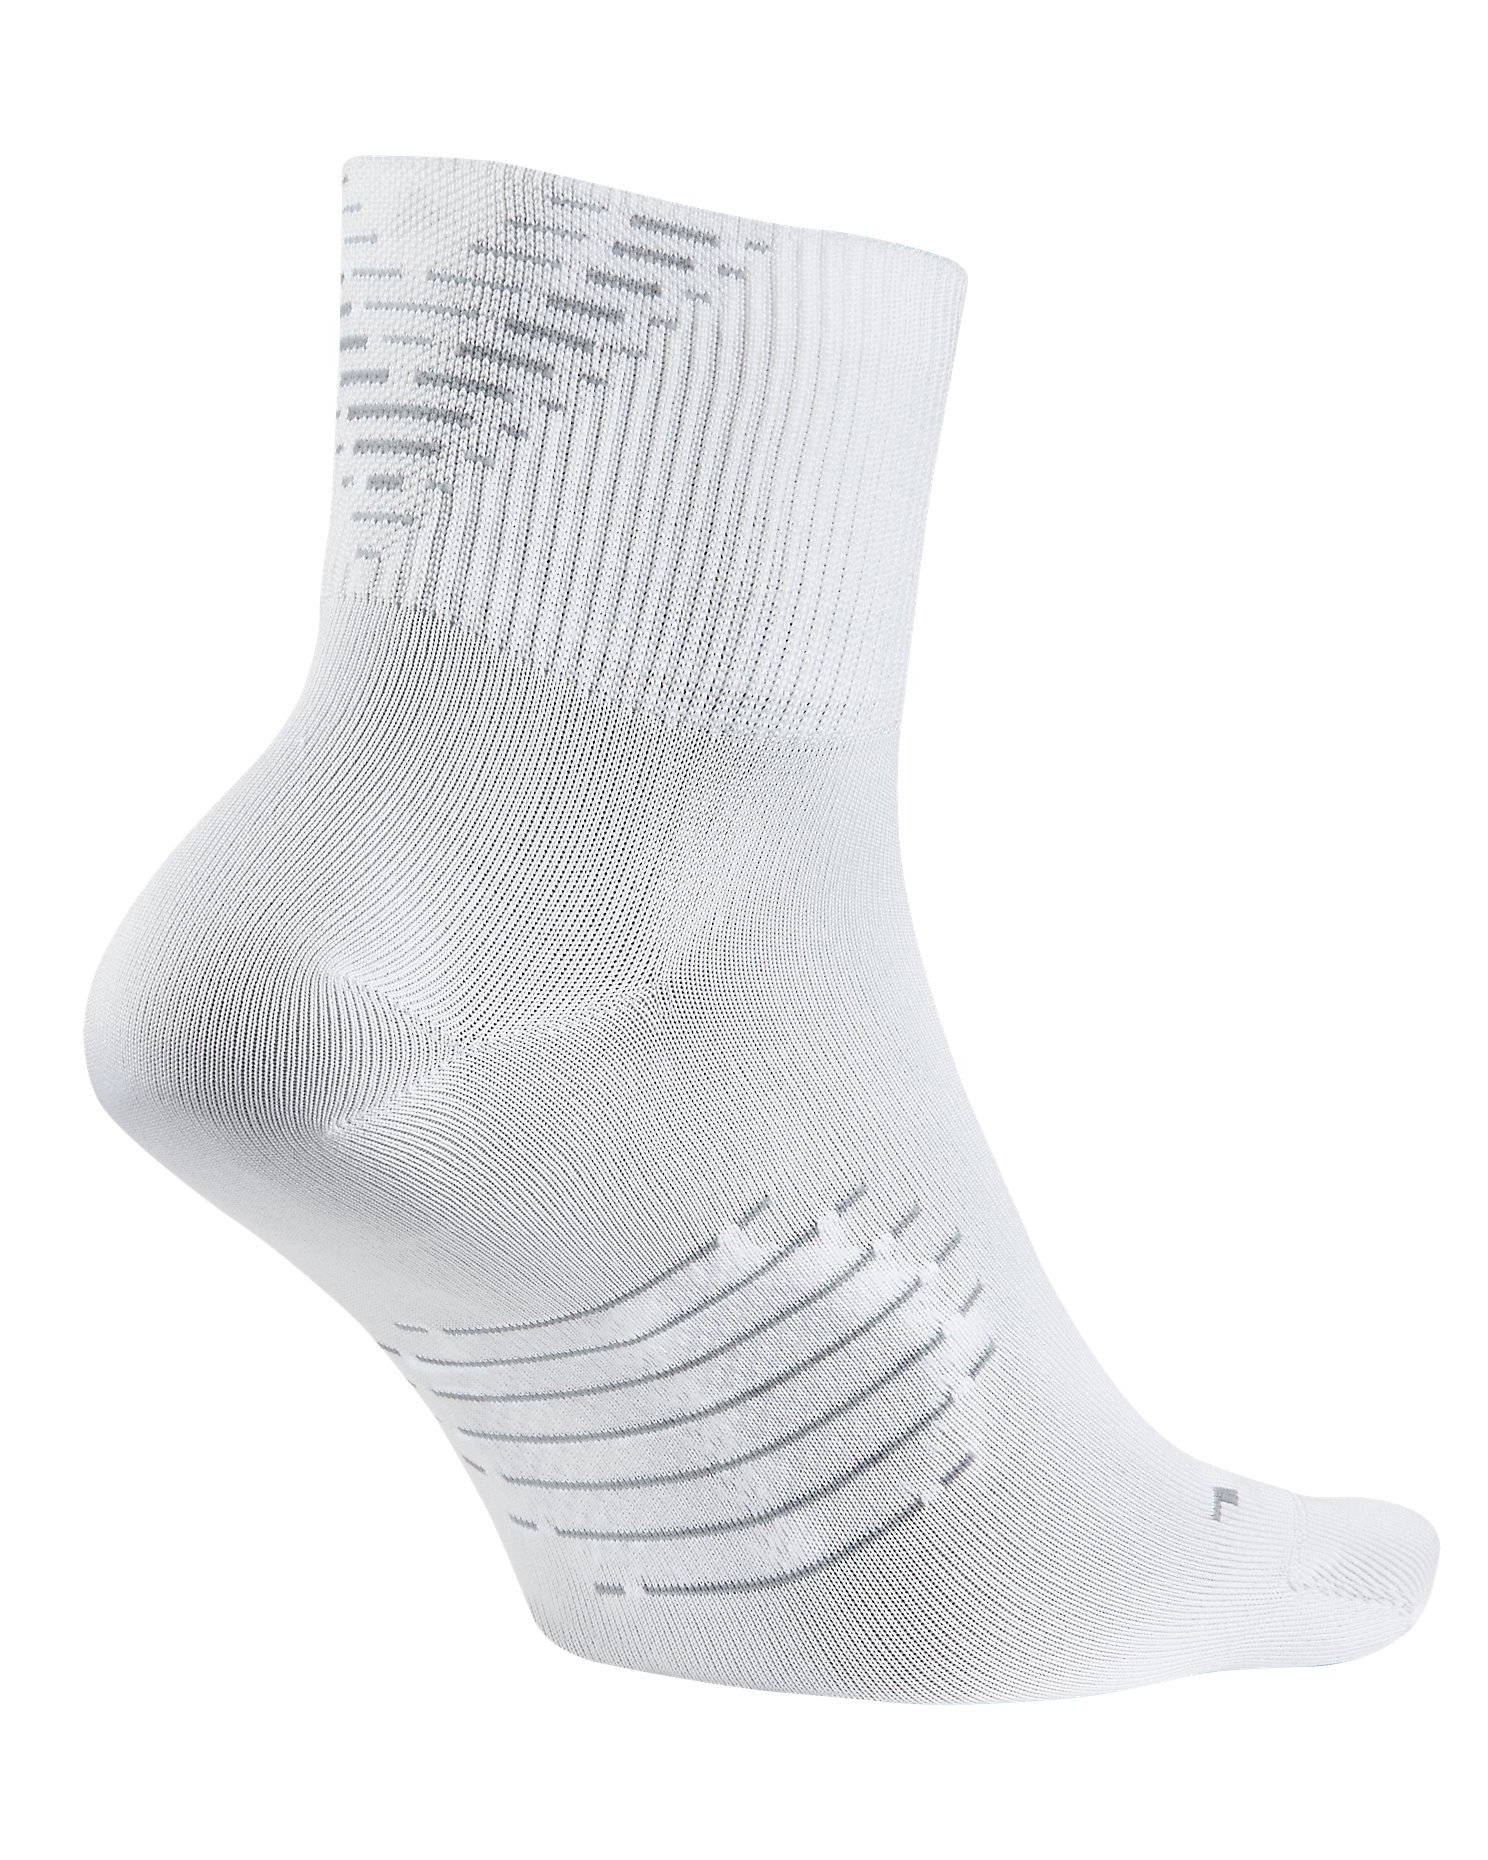 Ponožky Nike Elite Lightweight 2.0 Quarter